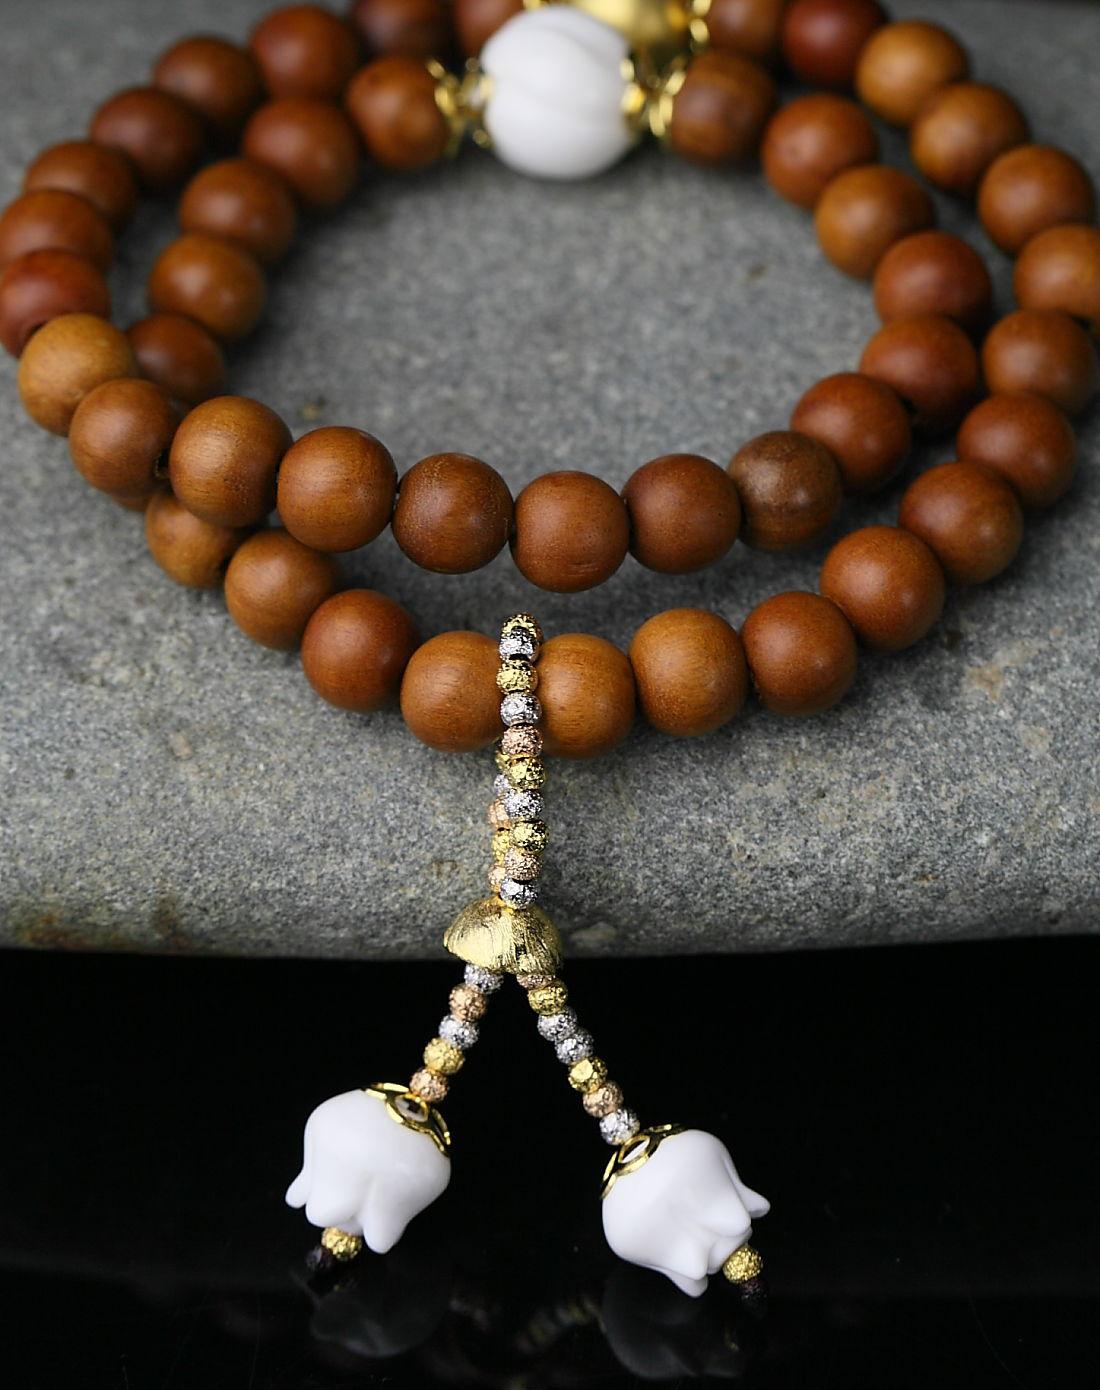 royal gem 原创设计-天然雷击枣木手串-双喜临门